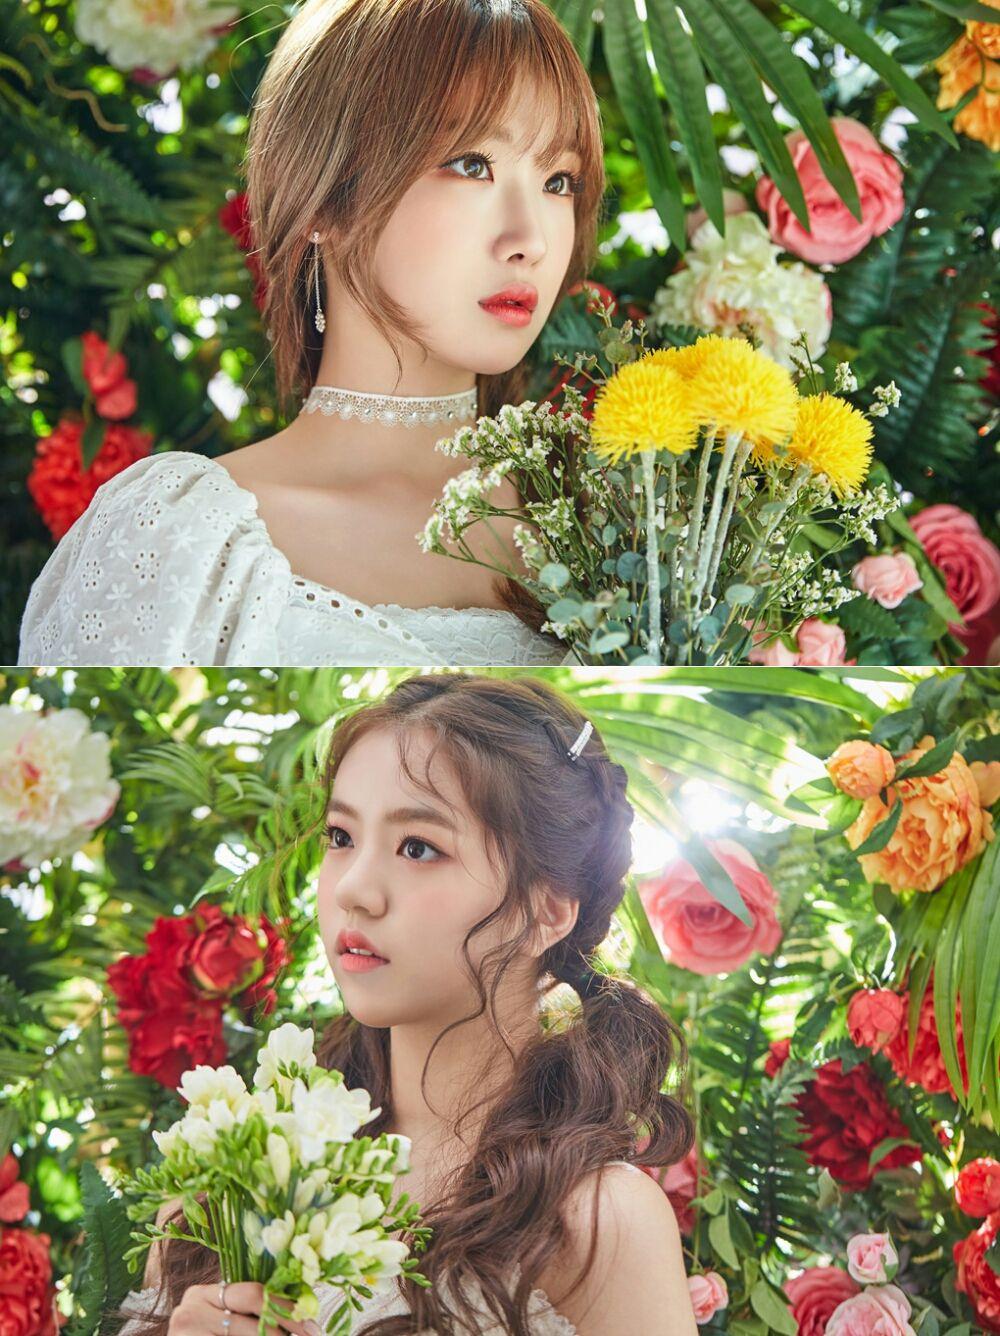 lirik lagu song lyrics seoryoung lena gwsn star touch heart wattpad